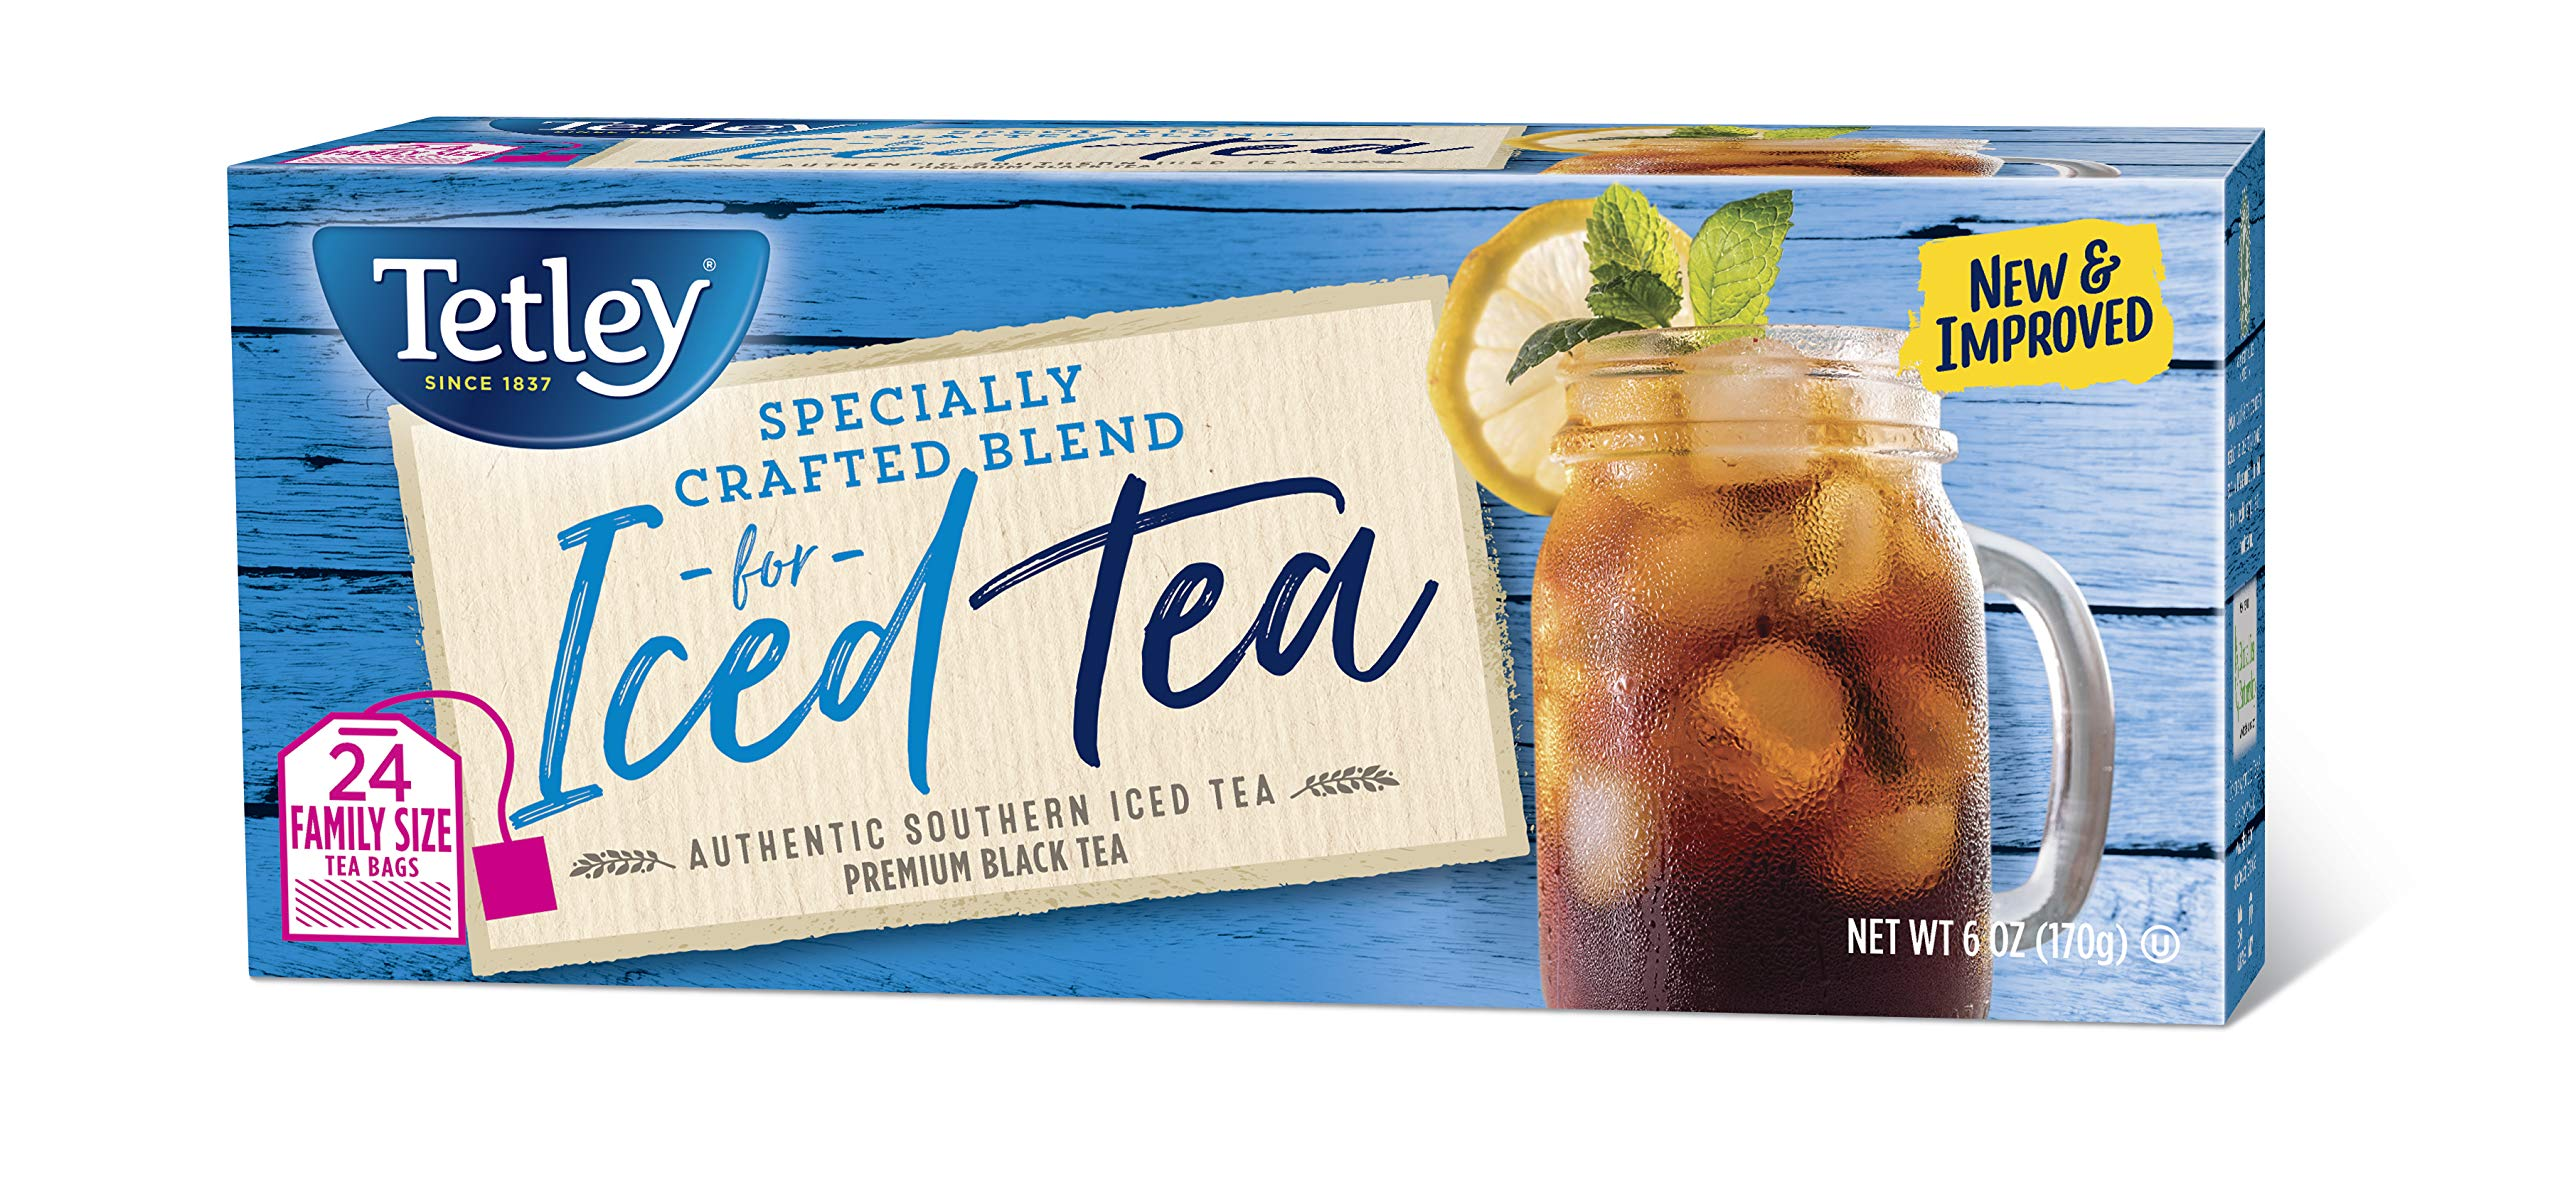 Tetley Black Tea, Iced Tea Blend, Family Size, 24 Square Tea Bags (Pack of 6)